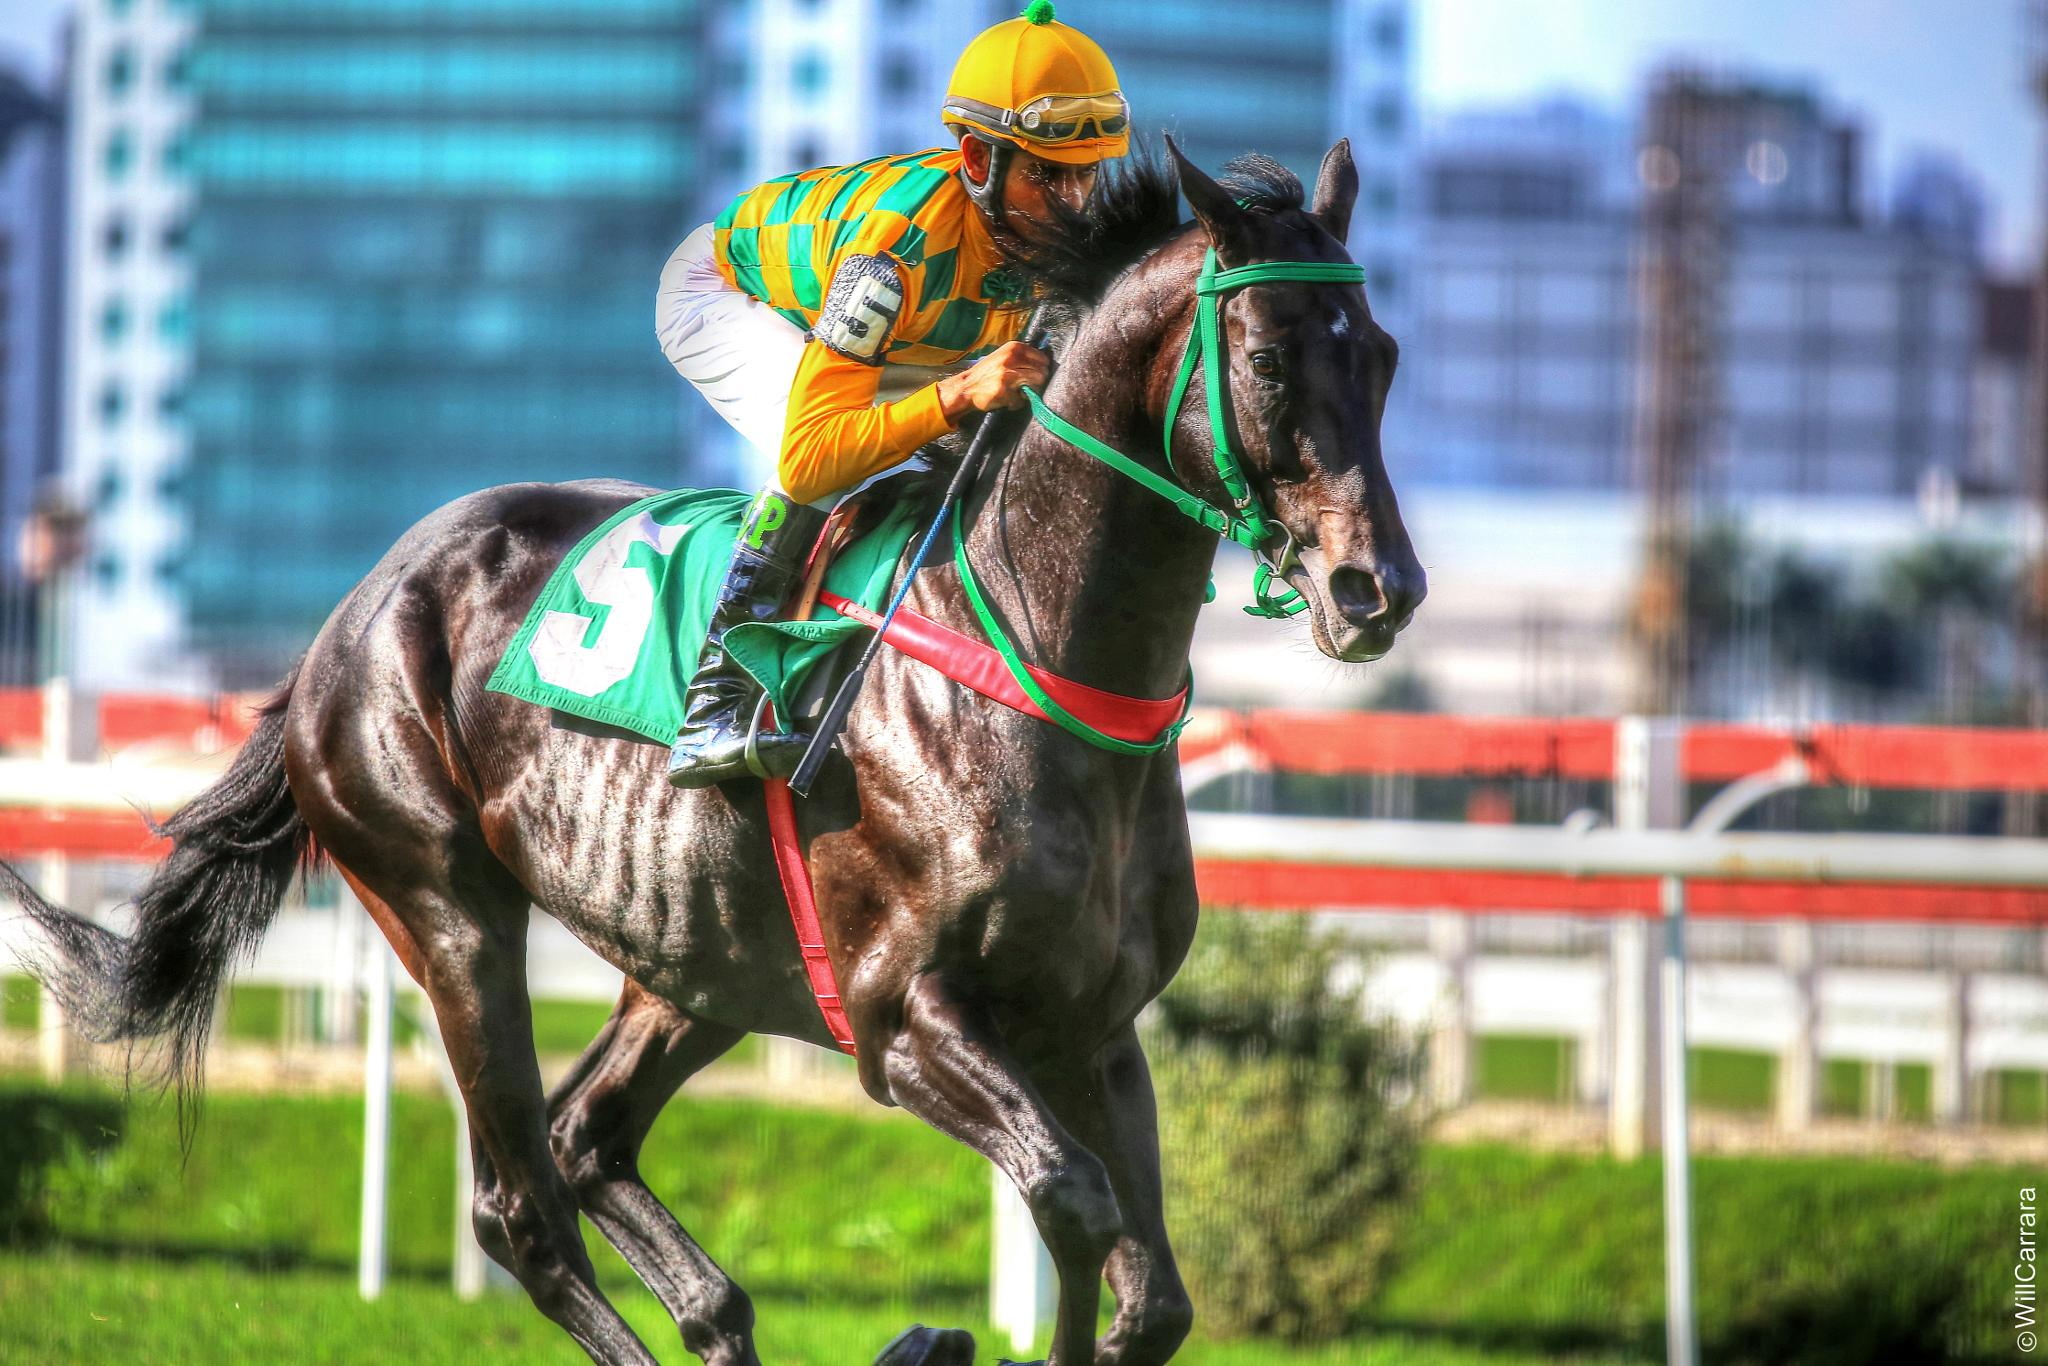 Jockey Club de São Paulo - HDRI - Brasil by Will Carrara Photographer